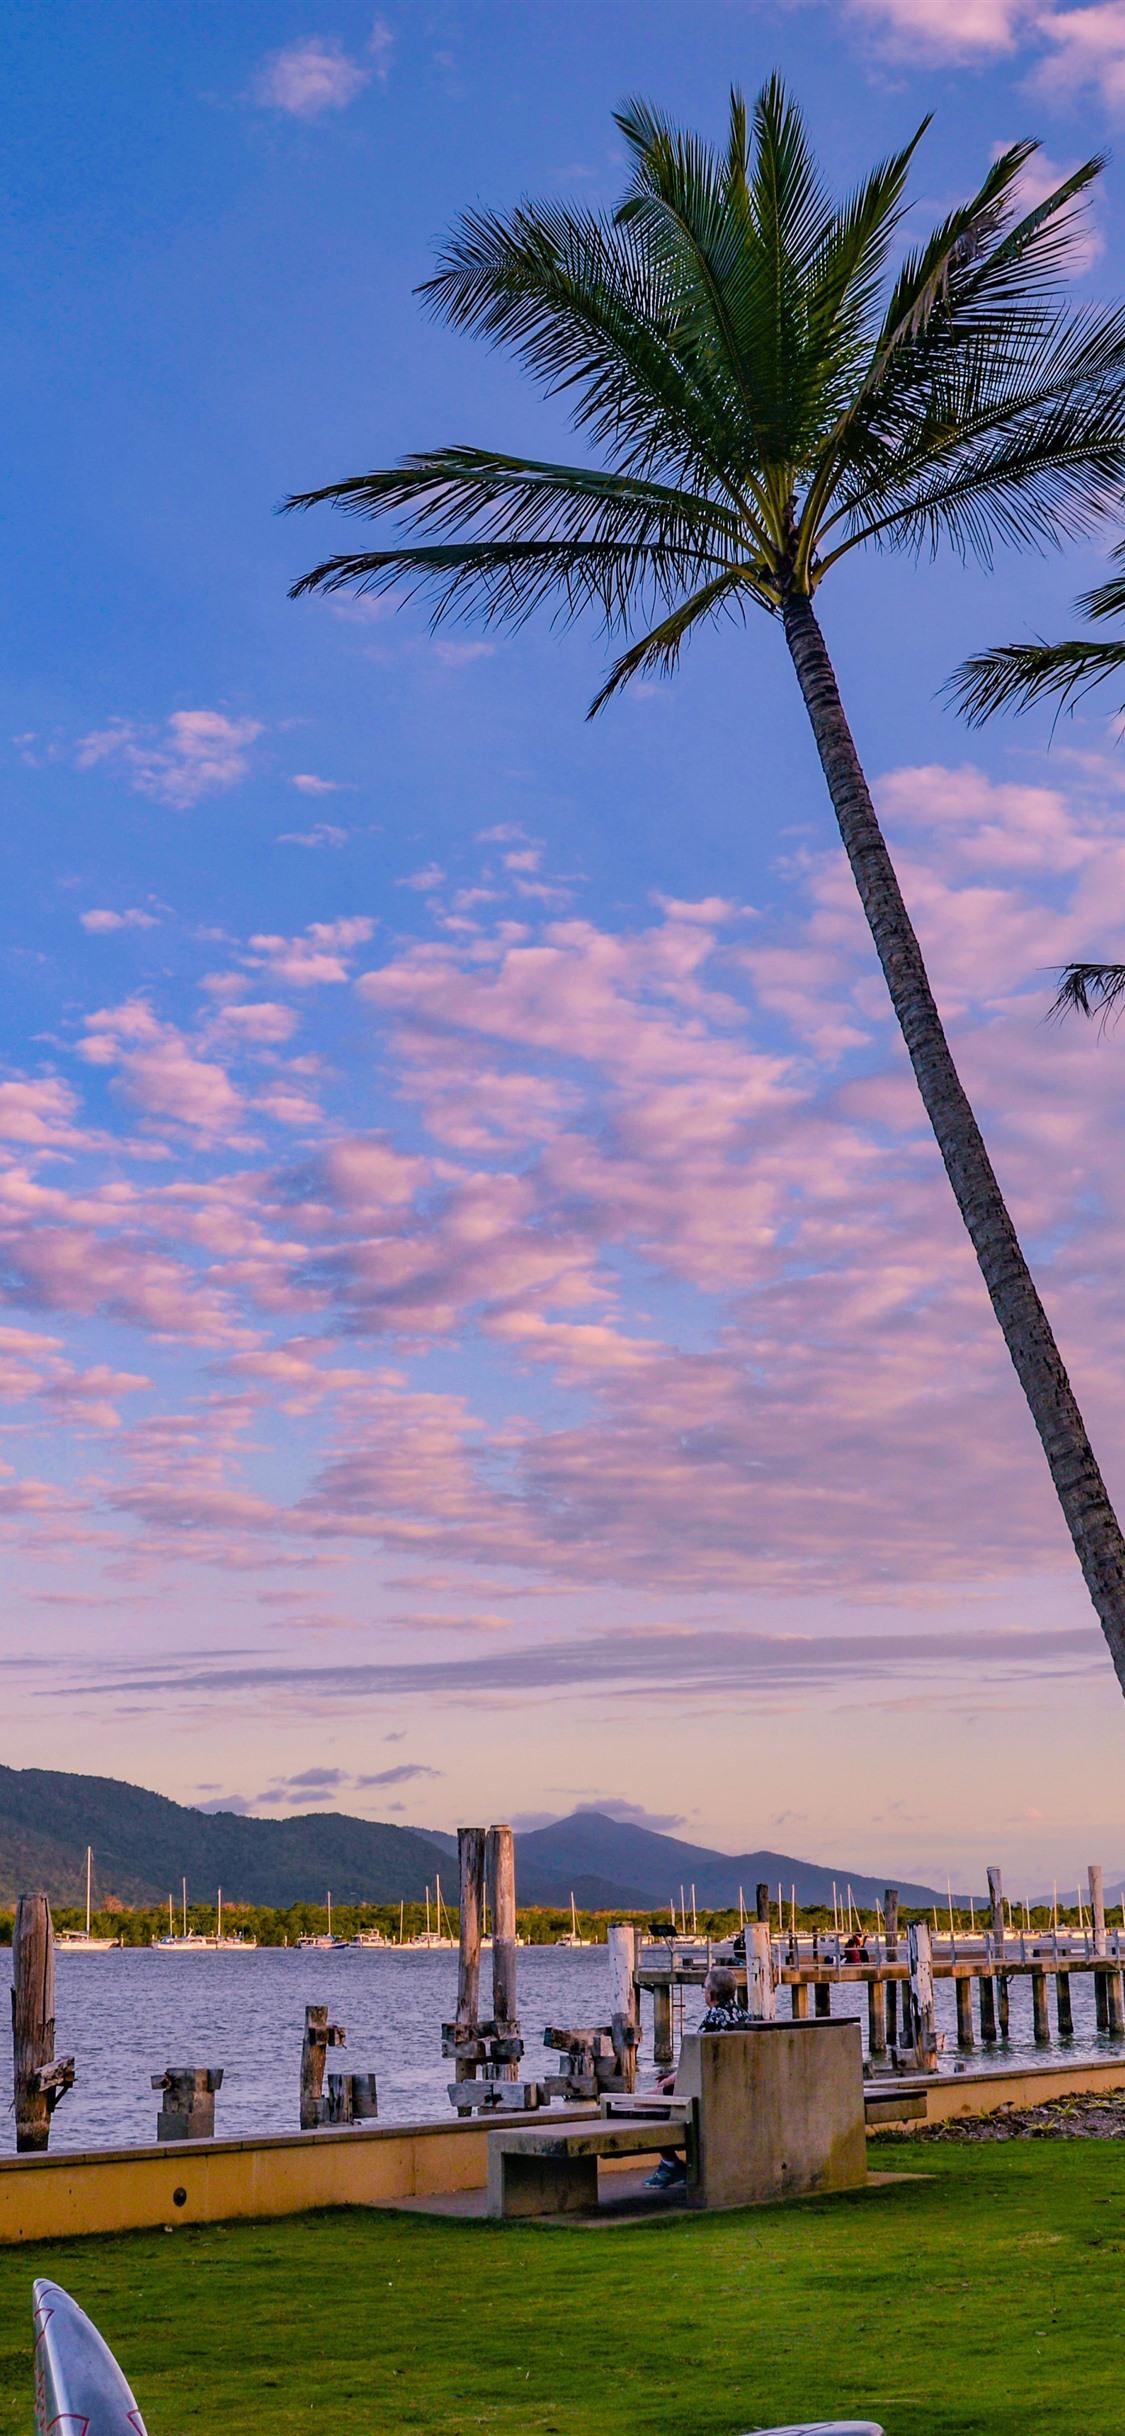 Kells Ireland Dusk Palm Trees Bay Clouds 1242x2688